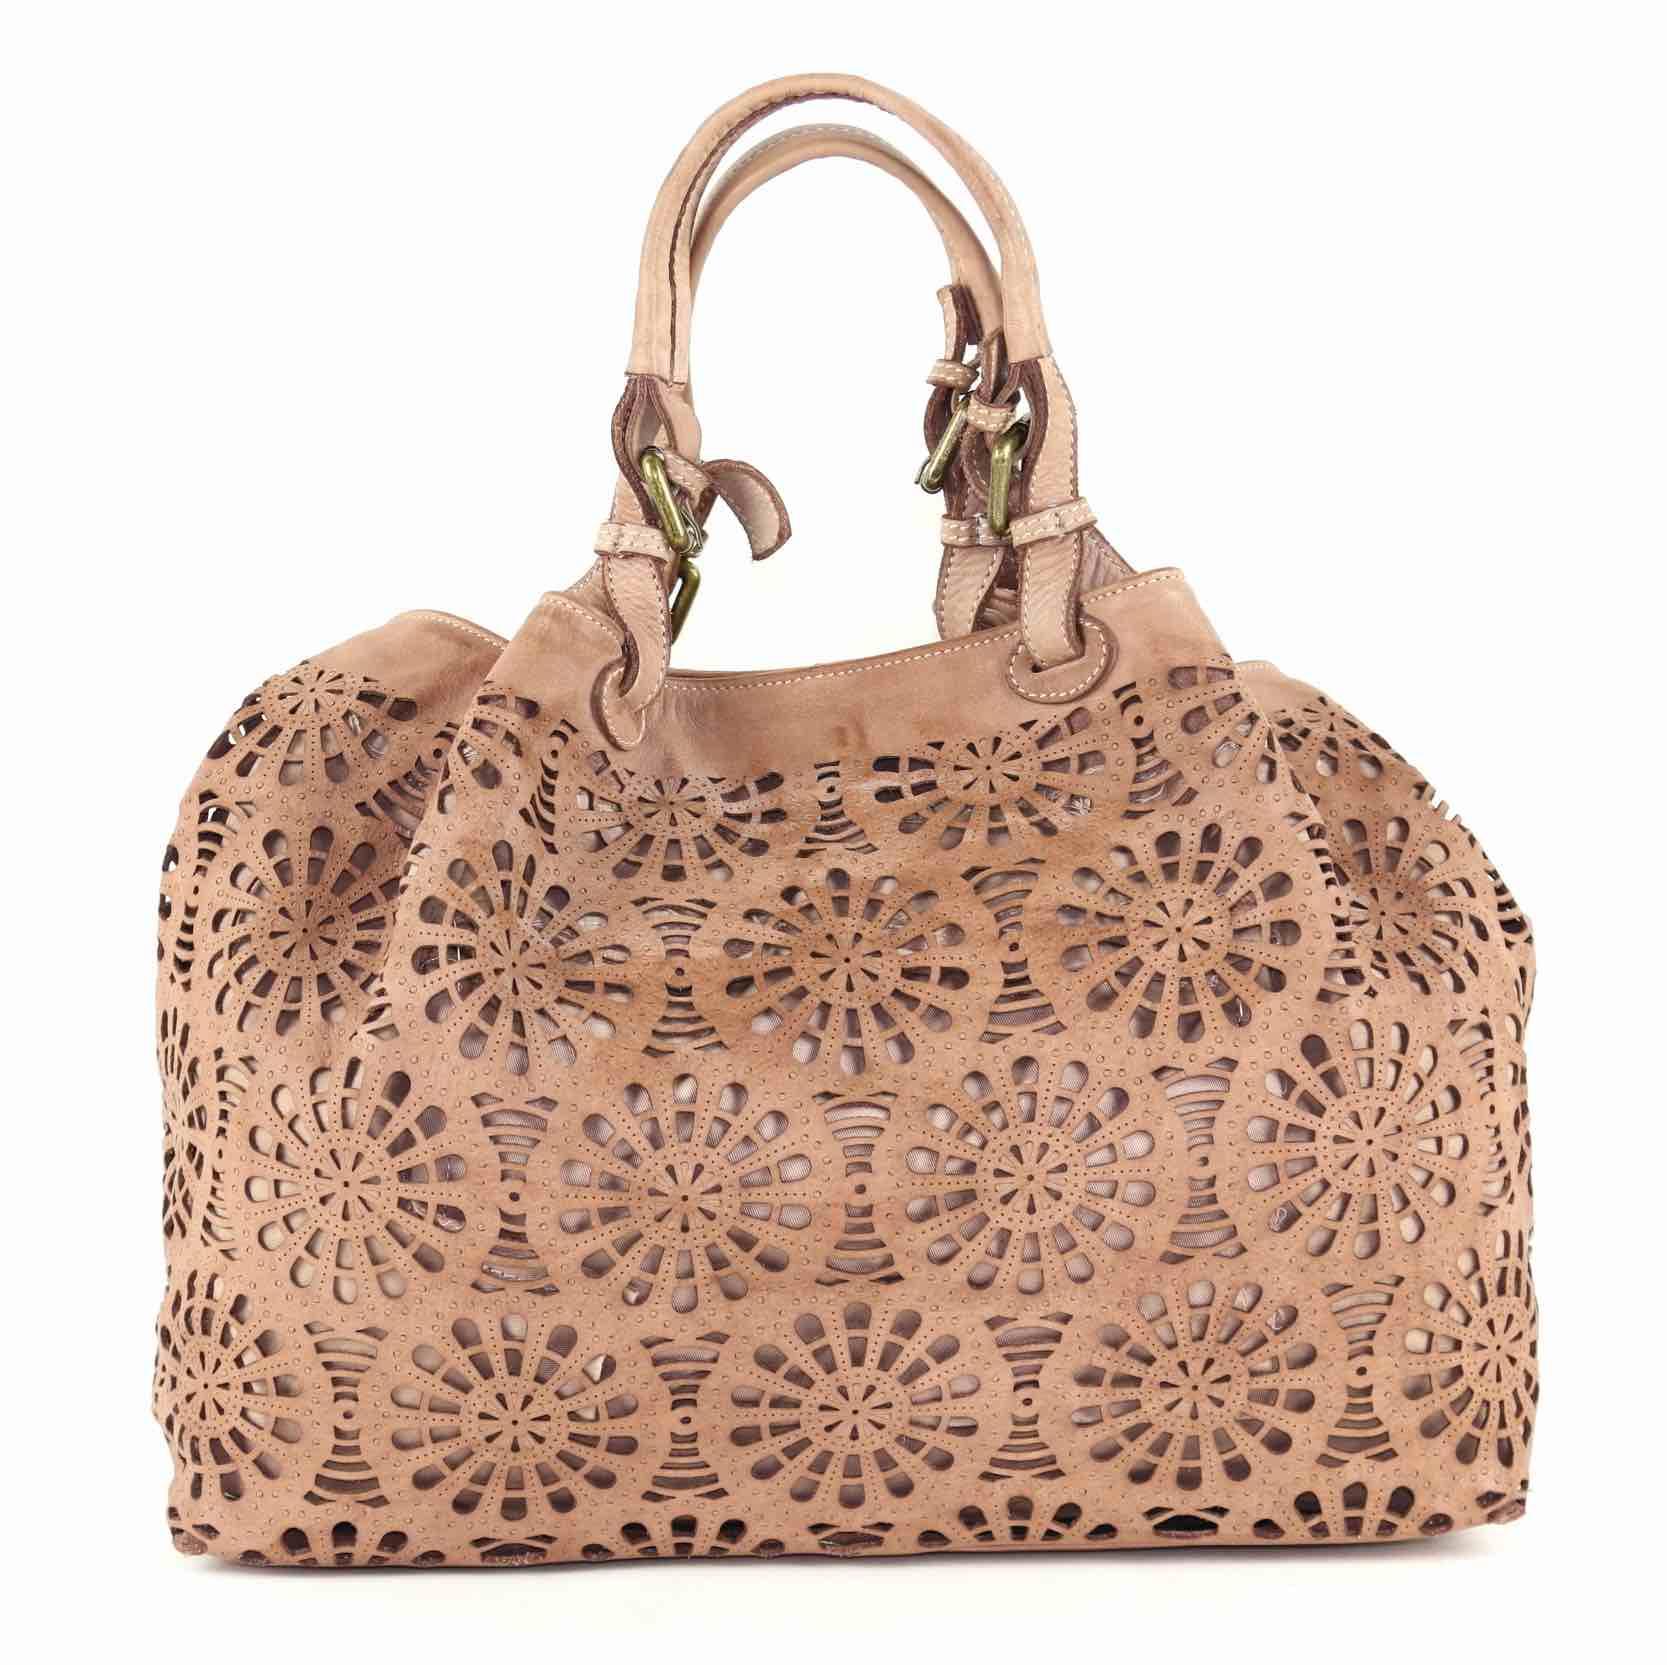 LUCIA Tote Bag Laser Cut Detail Blush